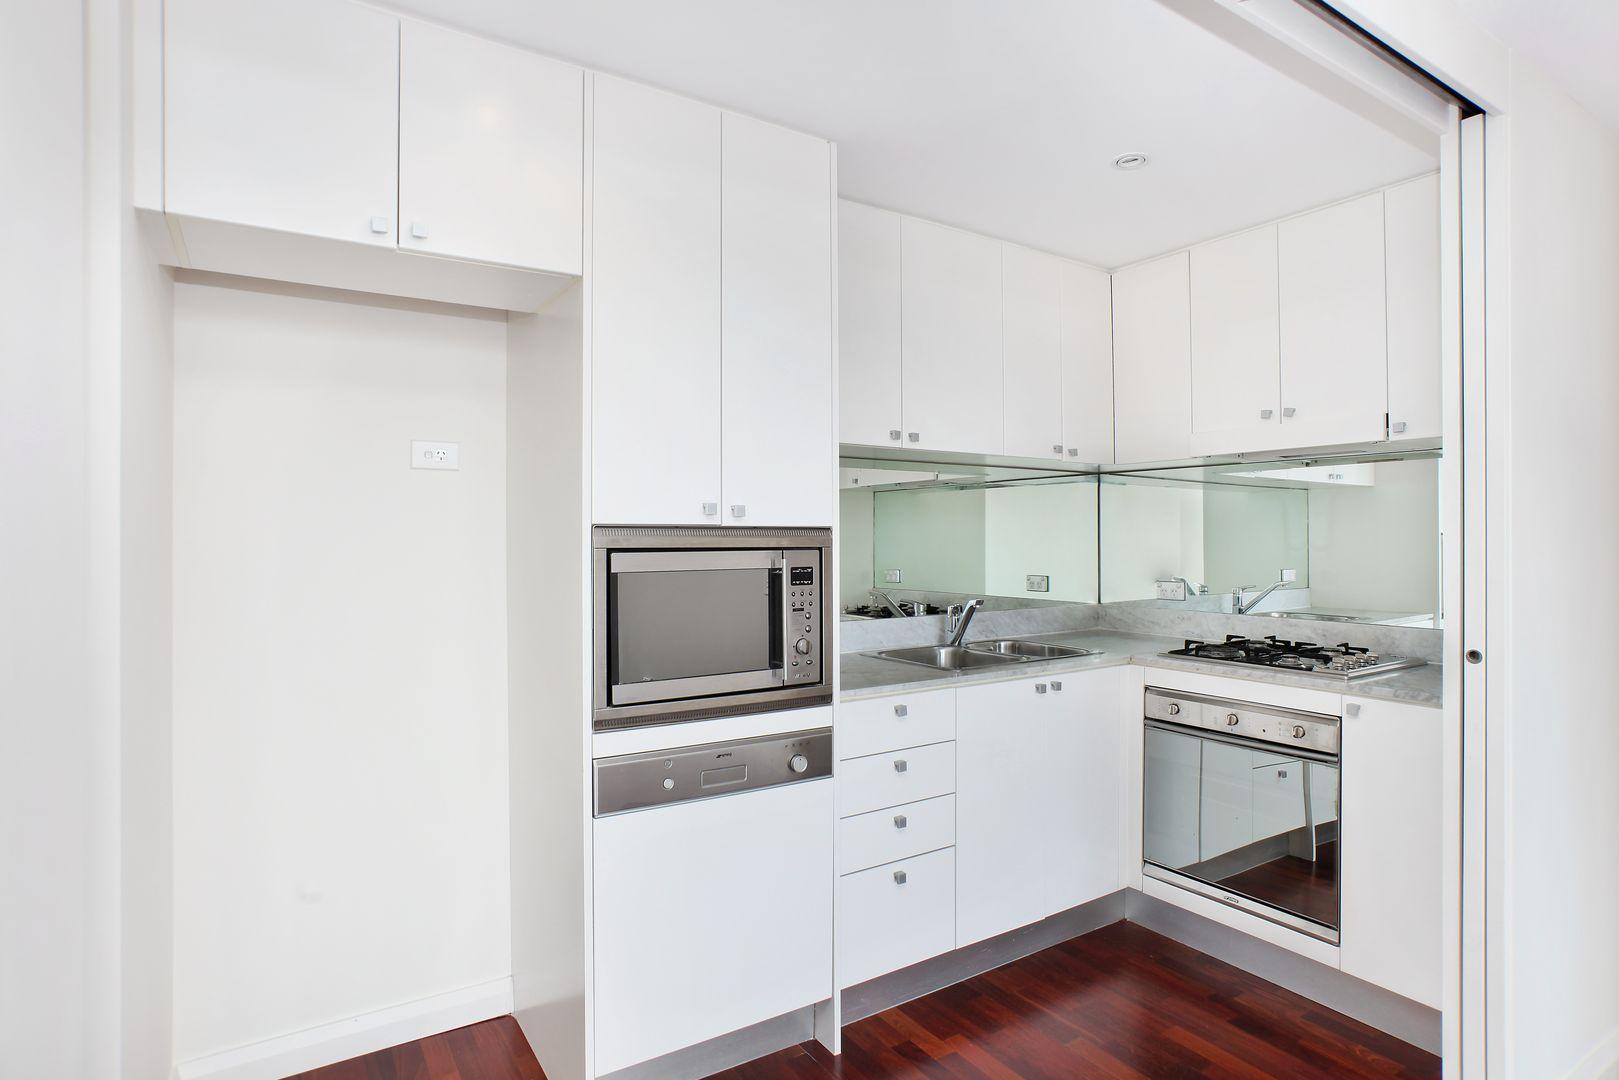 308/4-12 Garfield Street, Five Dock NSW 2046, Image 0